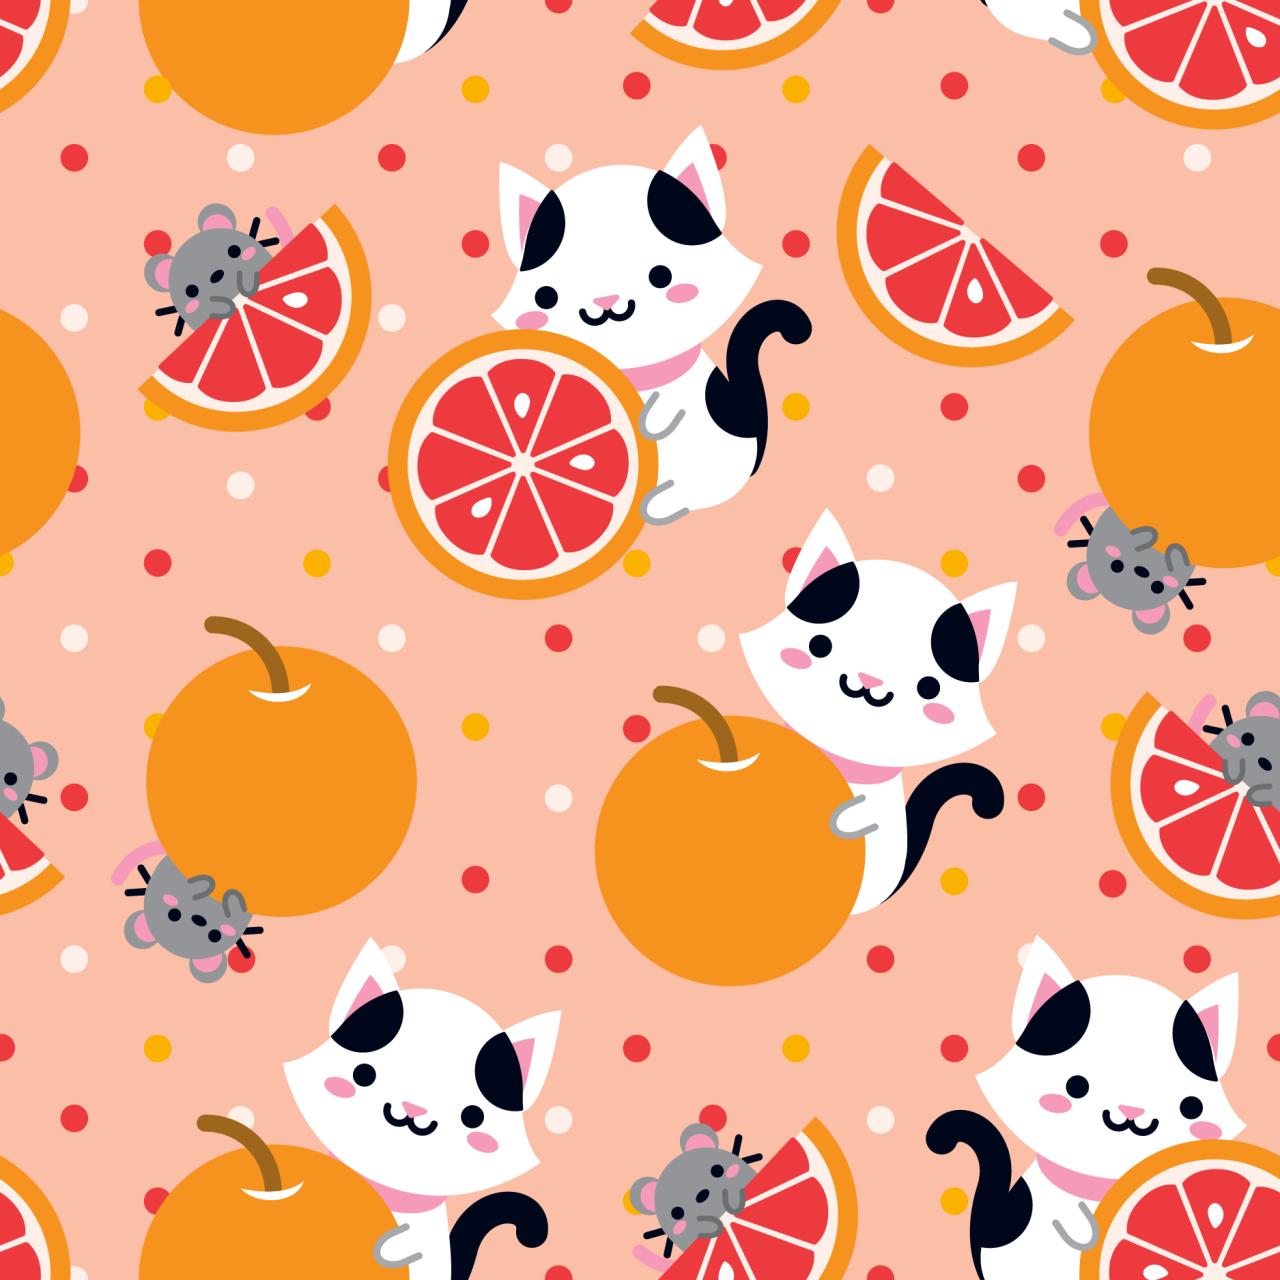 Grapefruit (* ^ ω ^) – Toranja (* ^ ω ^)